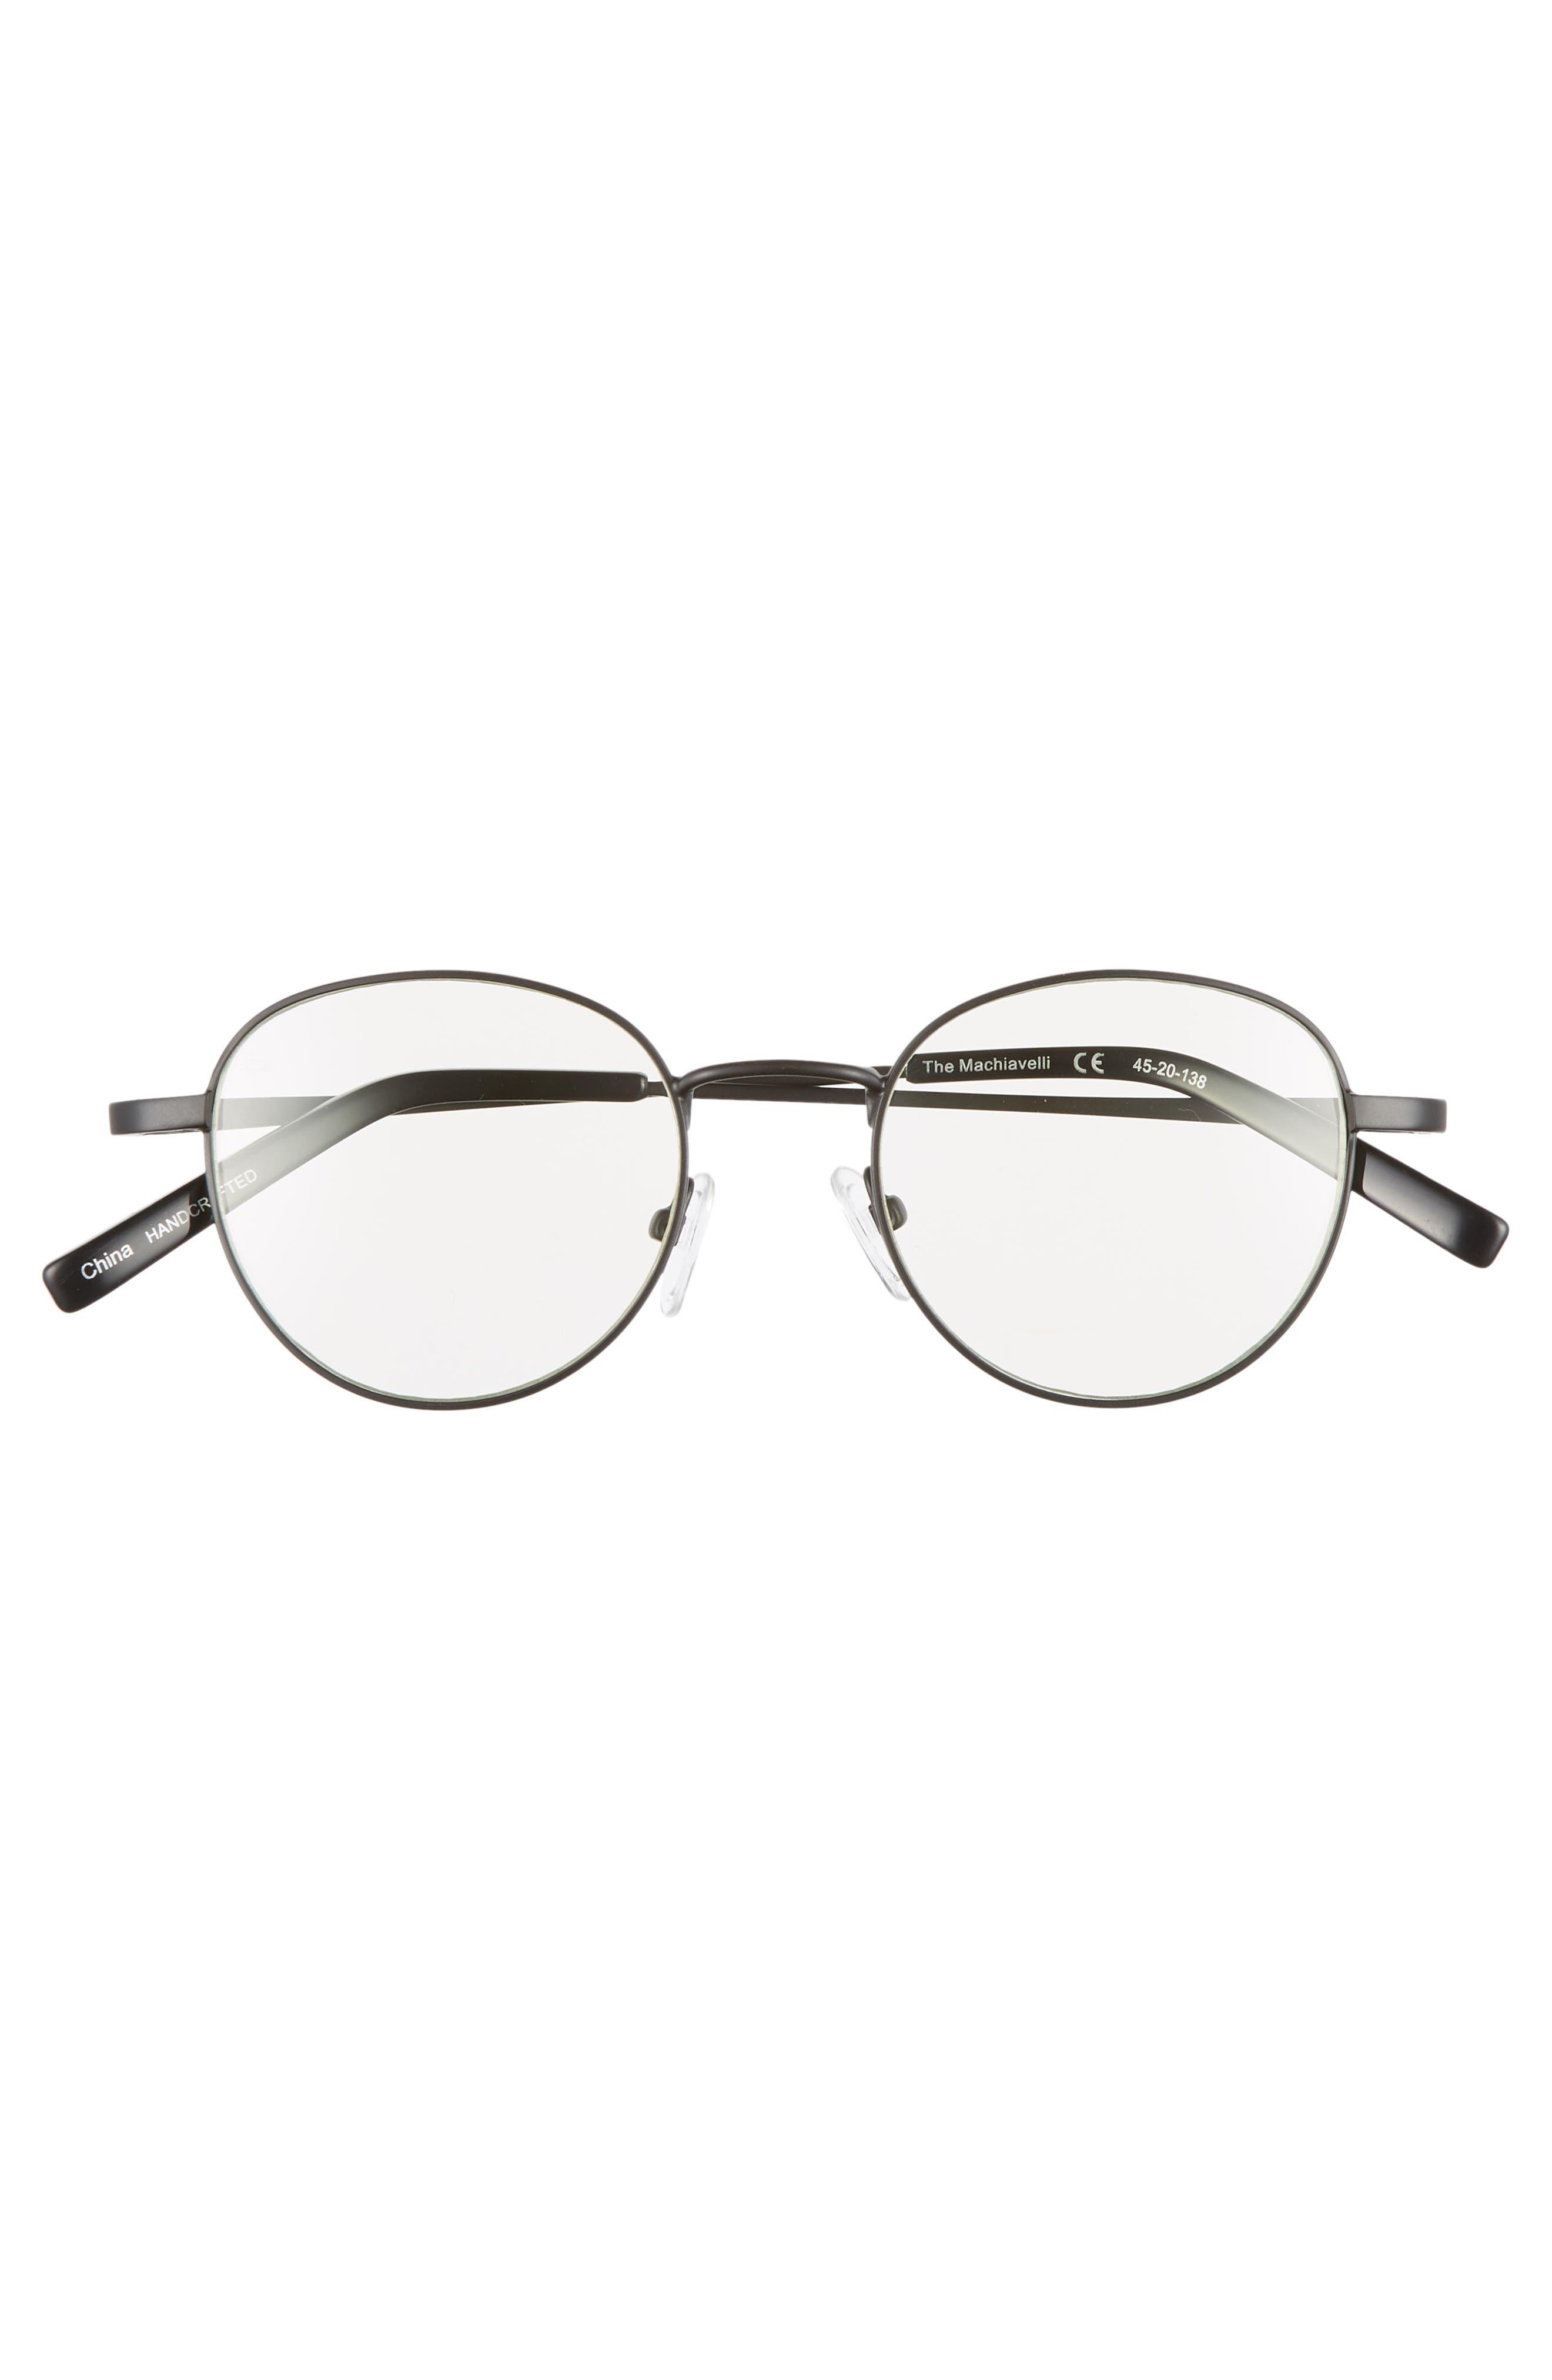 Privé Revaux The Machiavelli 45mm Blue Light Blocking Glasses,                             Alternate thumbnail 3, color,                             001